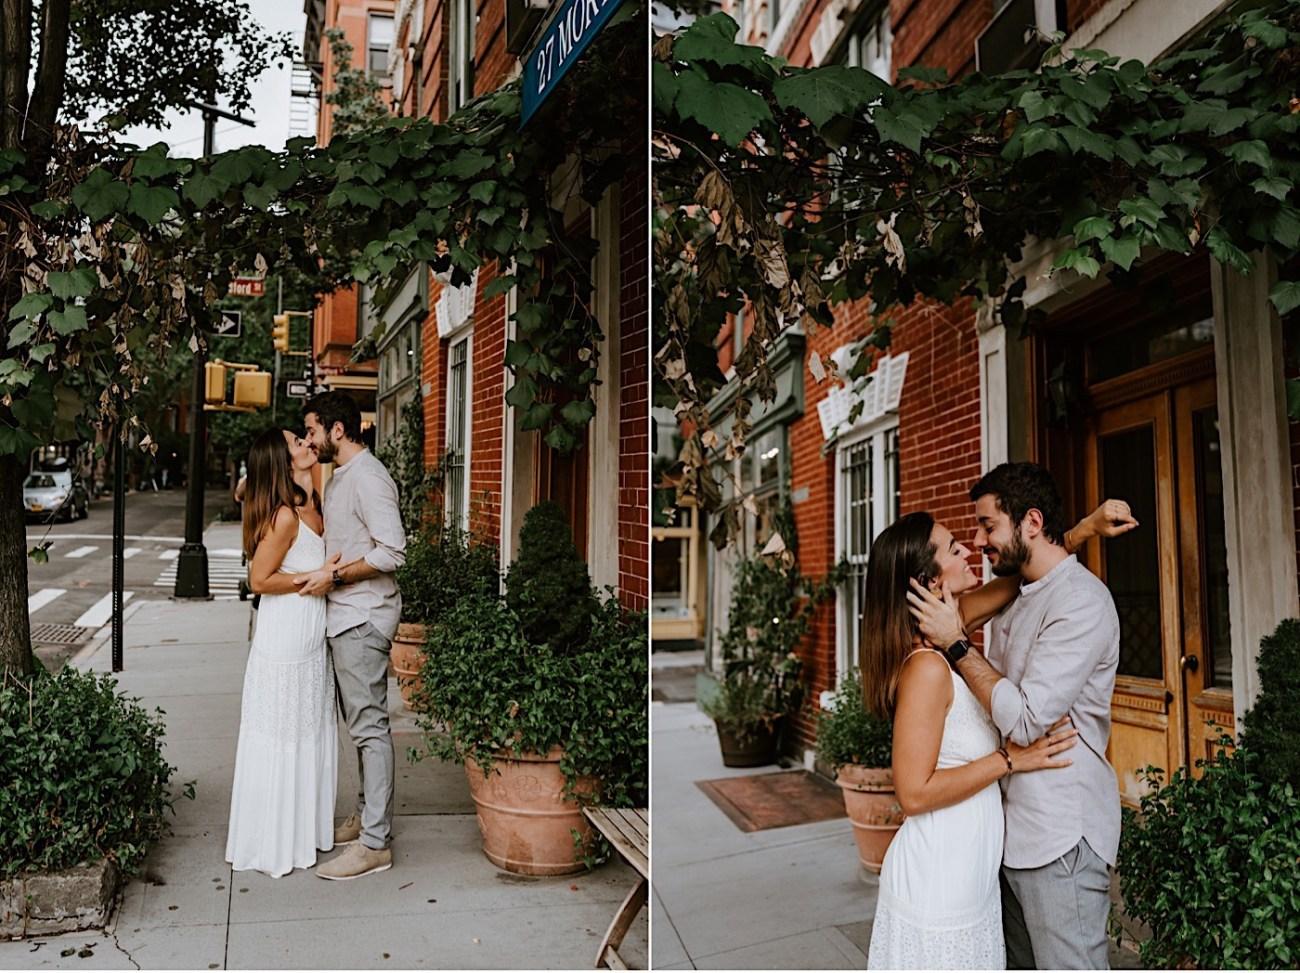 Greenwich Village Couple Session Manhattan Engagement Session New York Wedding Photographer 06